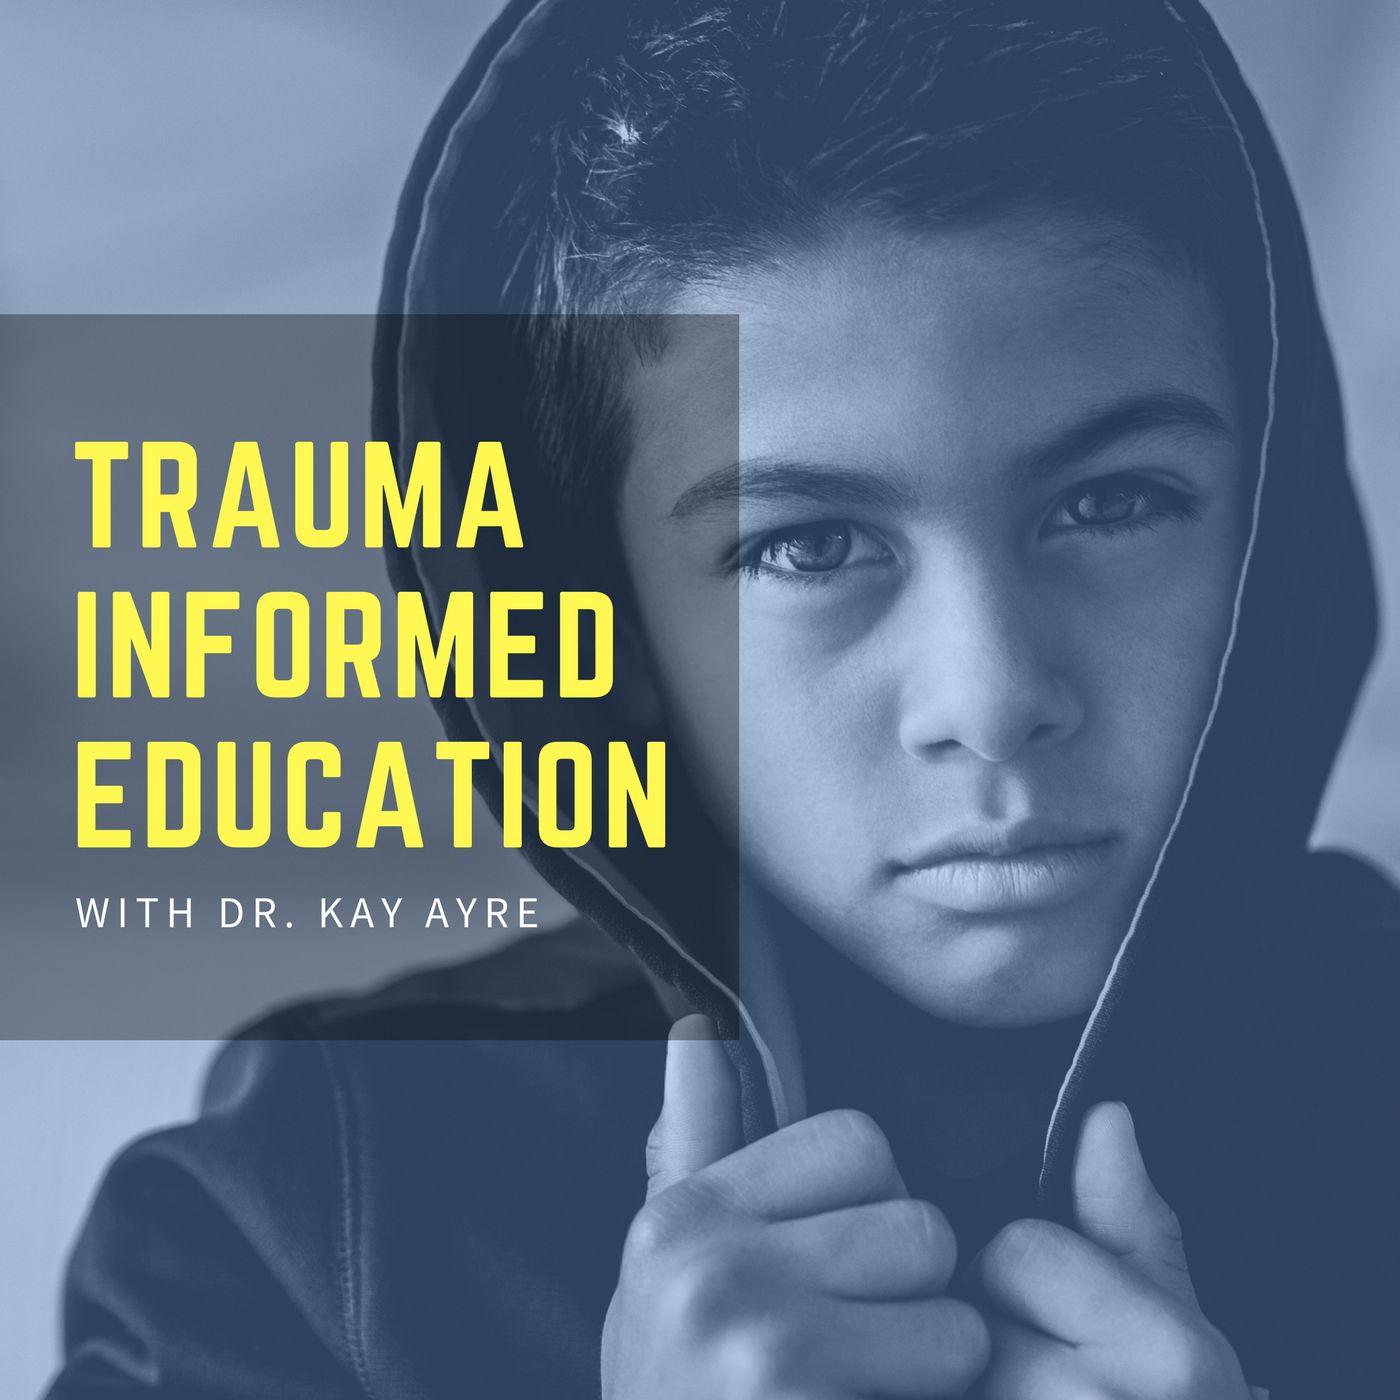 Trauma Informed Education